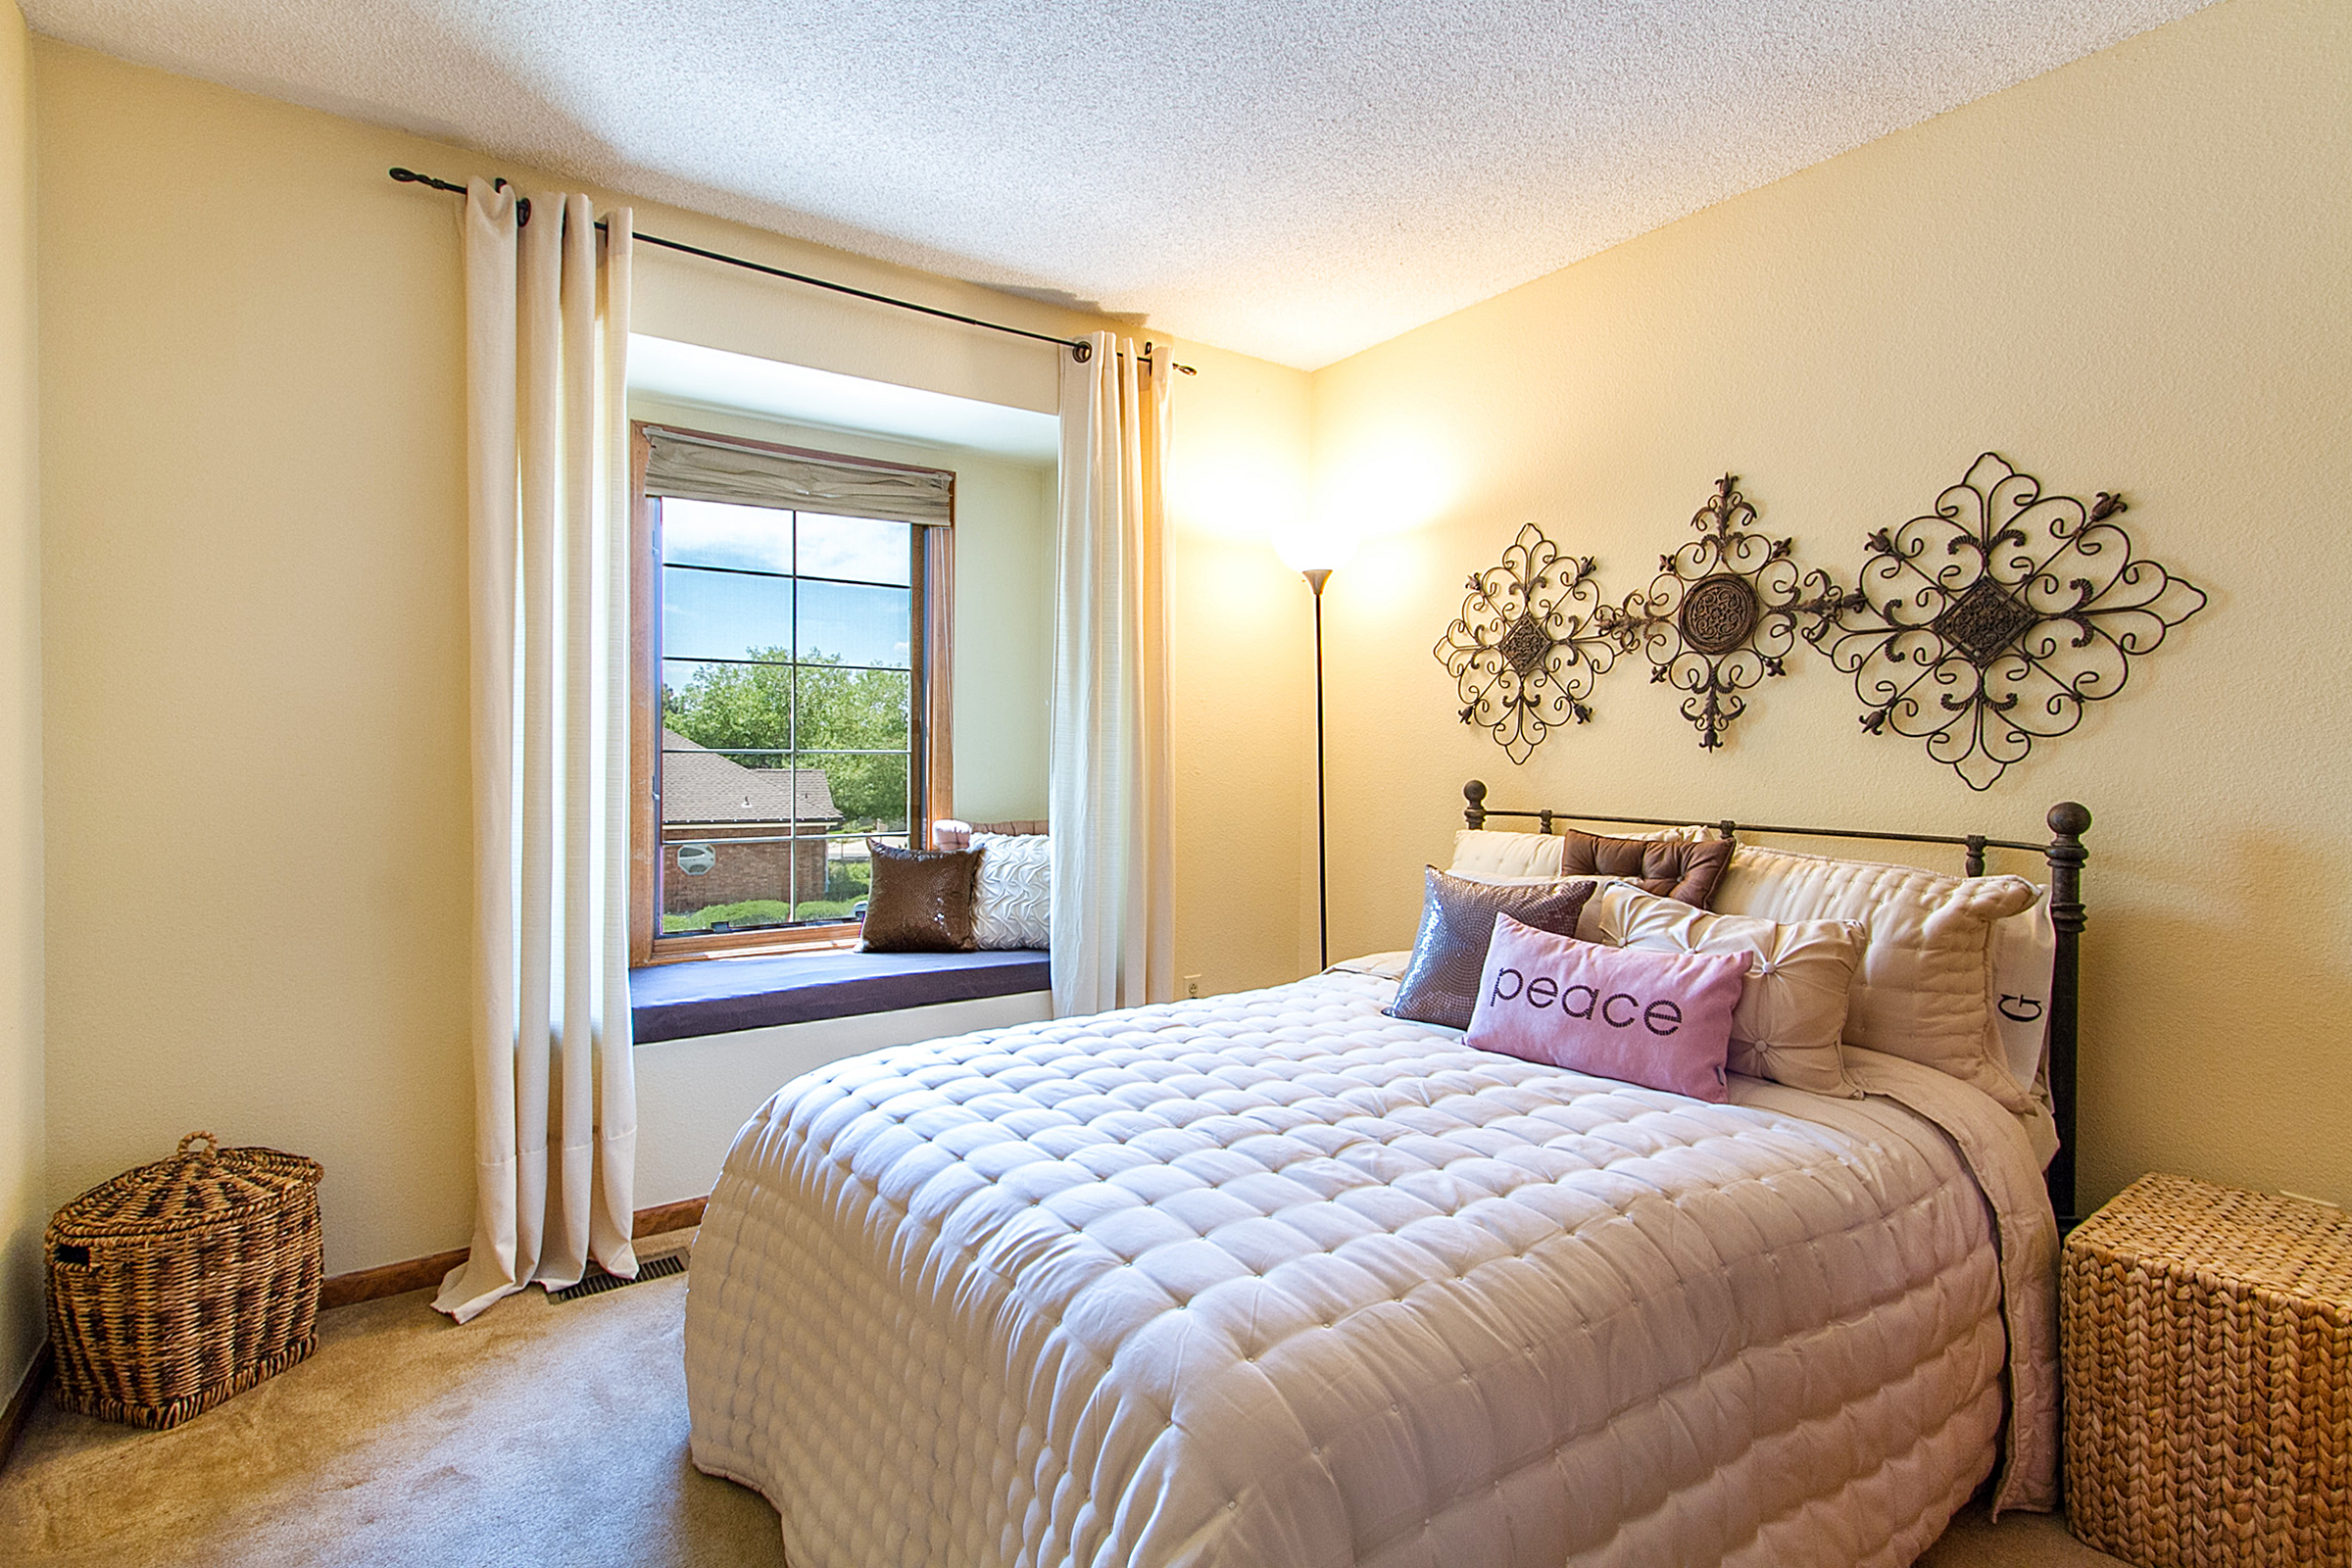 1297057_Charming-Bedroom-Two-Has-Window-Seat_high.jpg